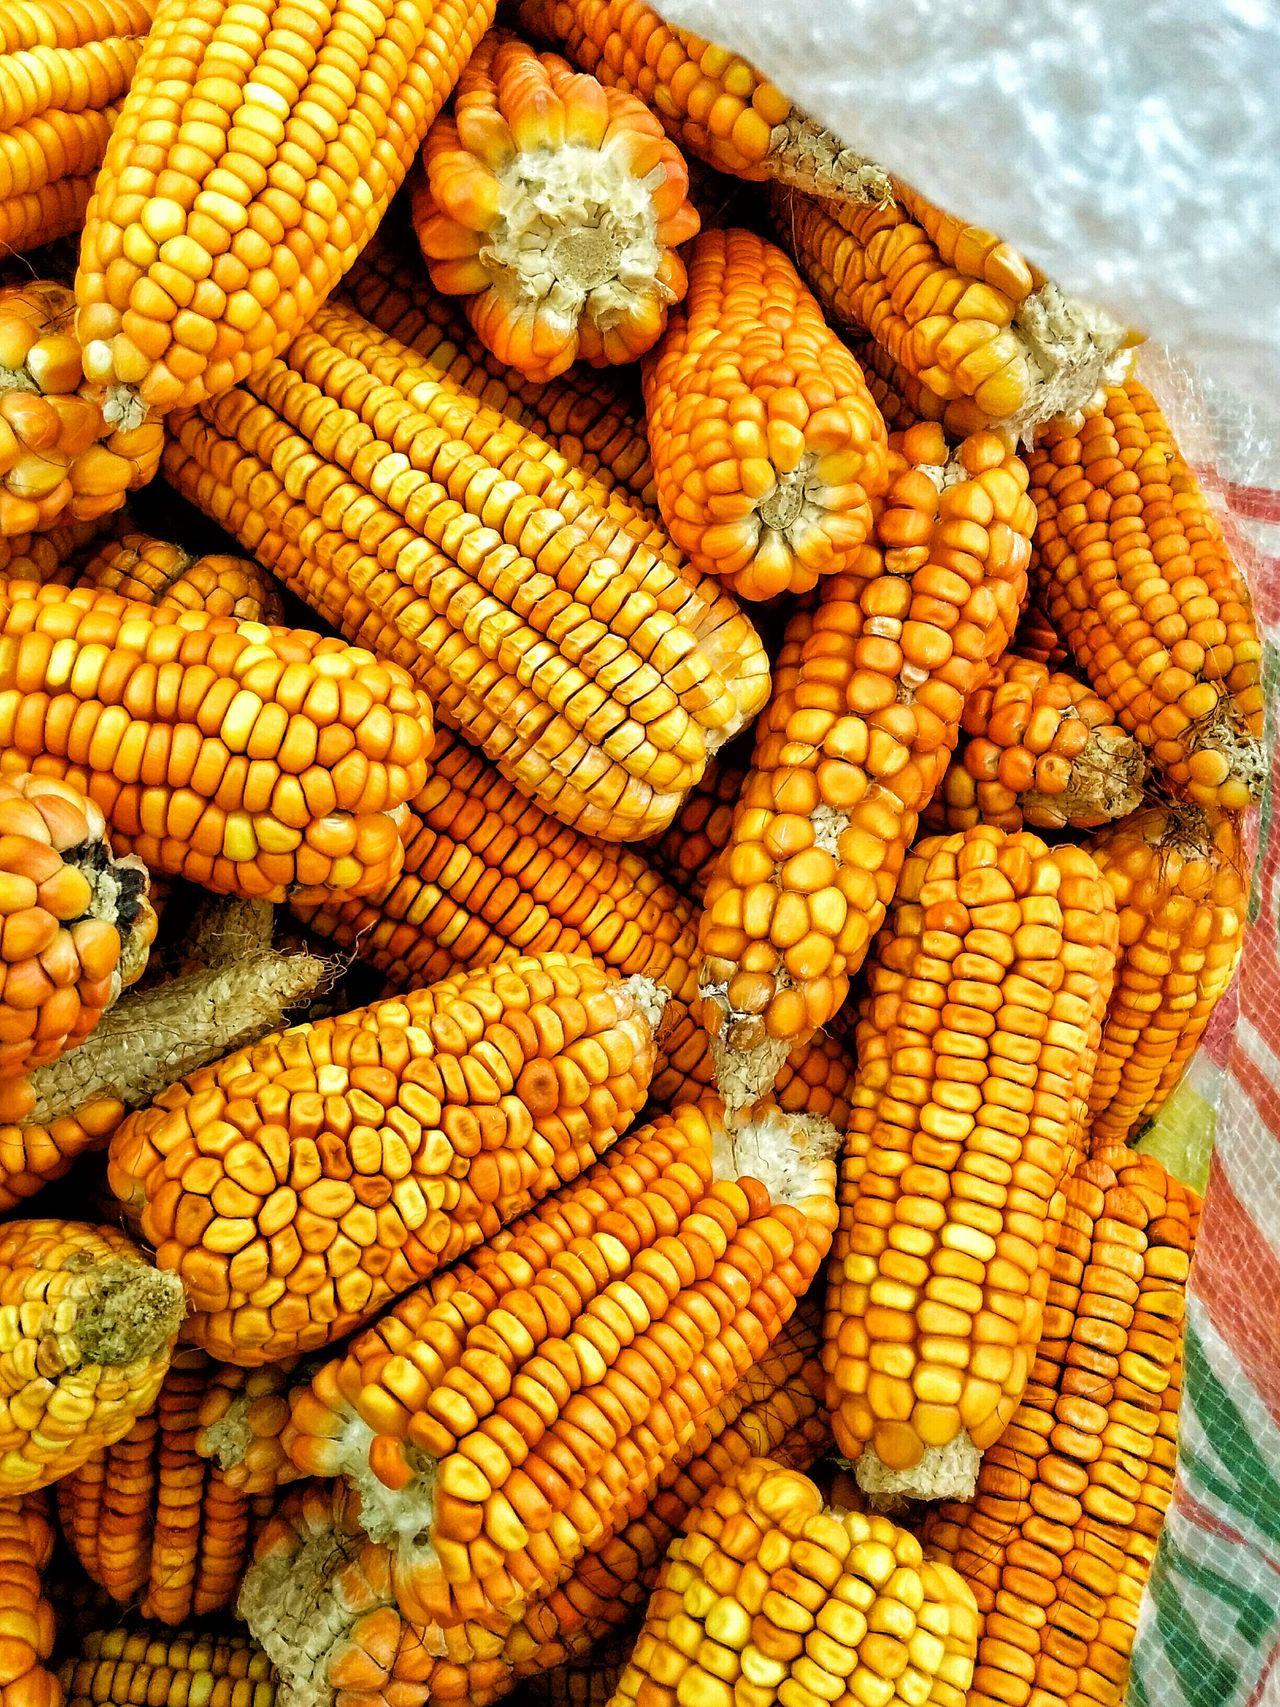 Korn Choclo Amarillo Maiz Goodlooking Foodphotography